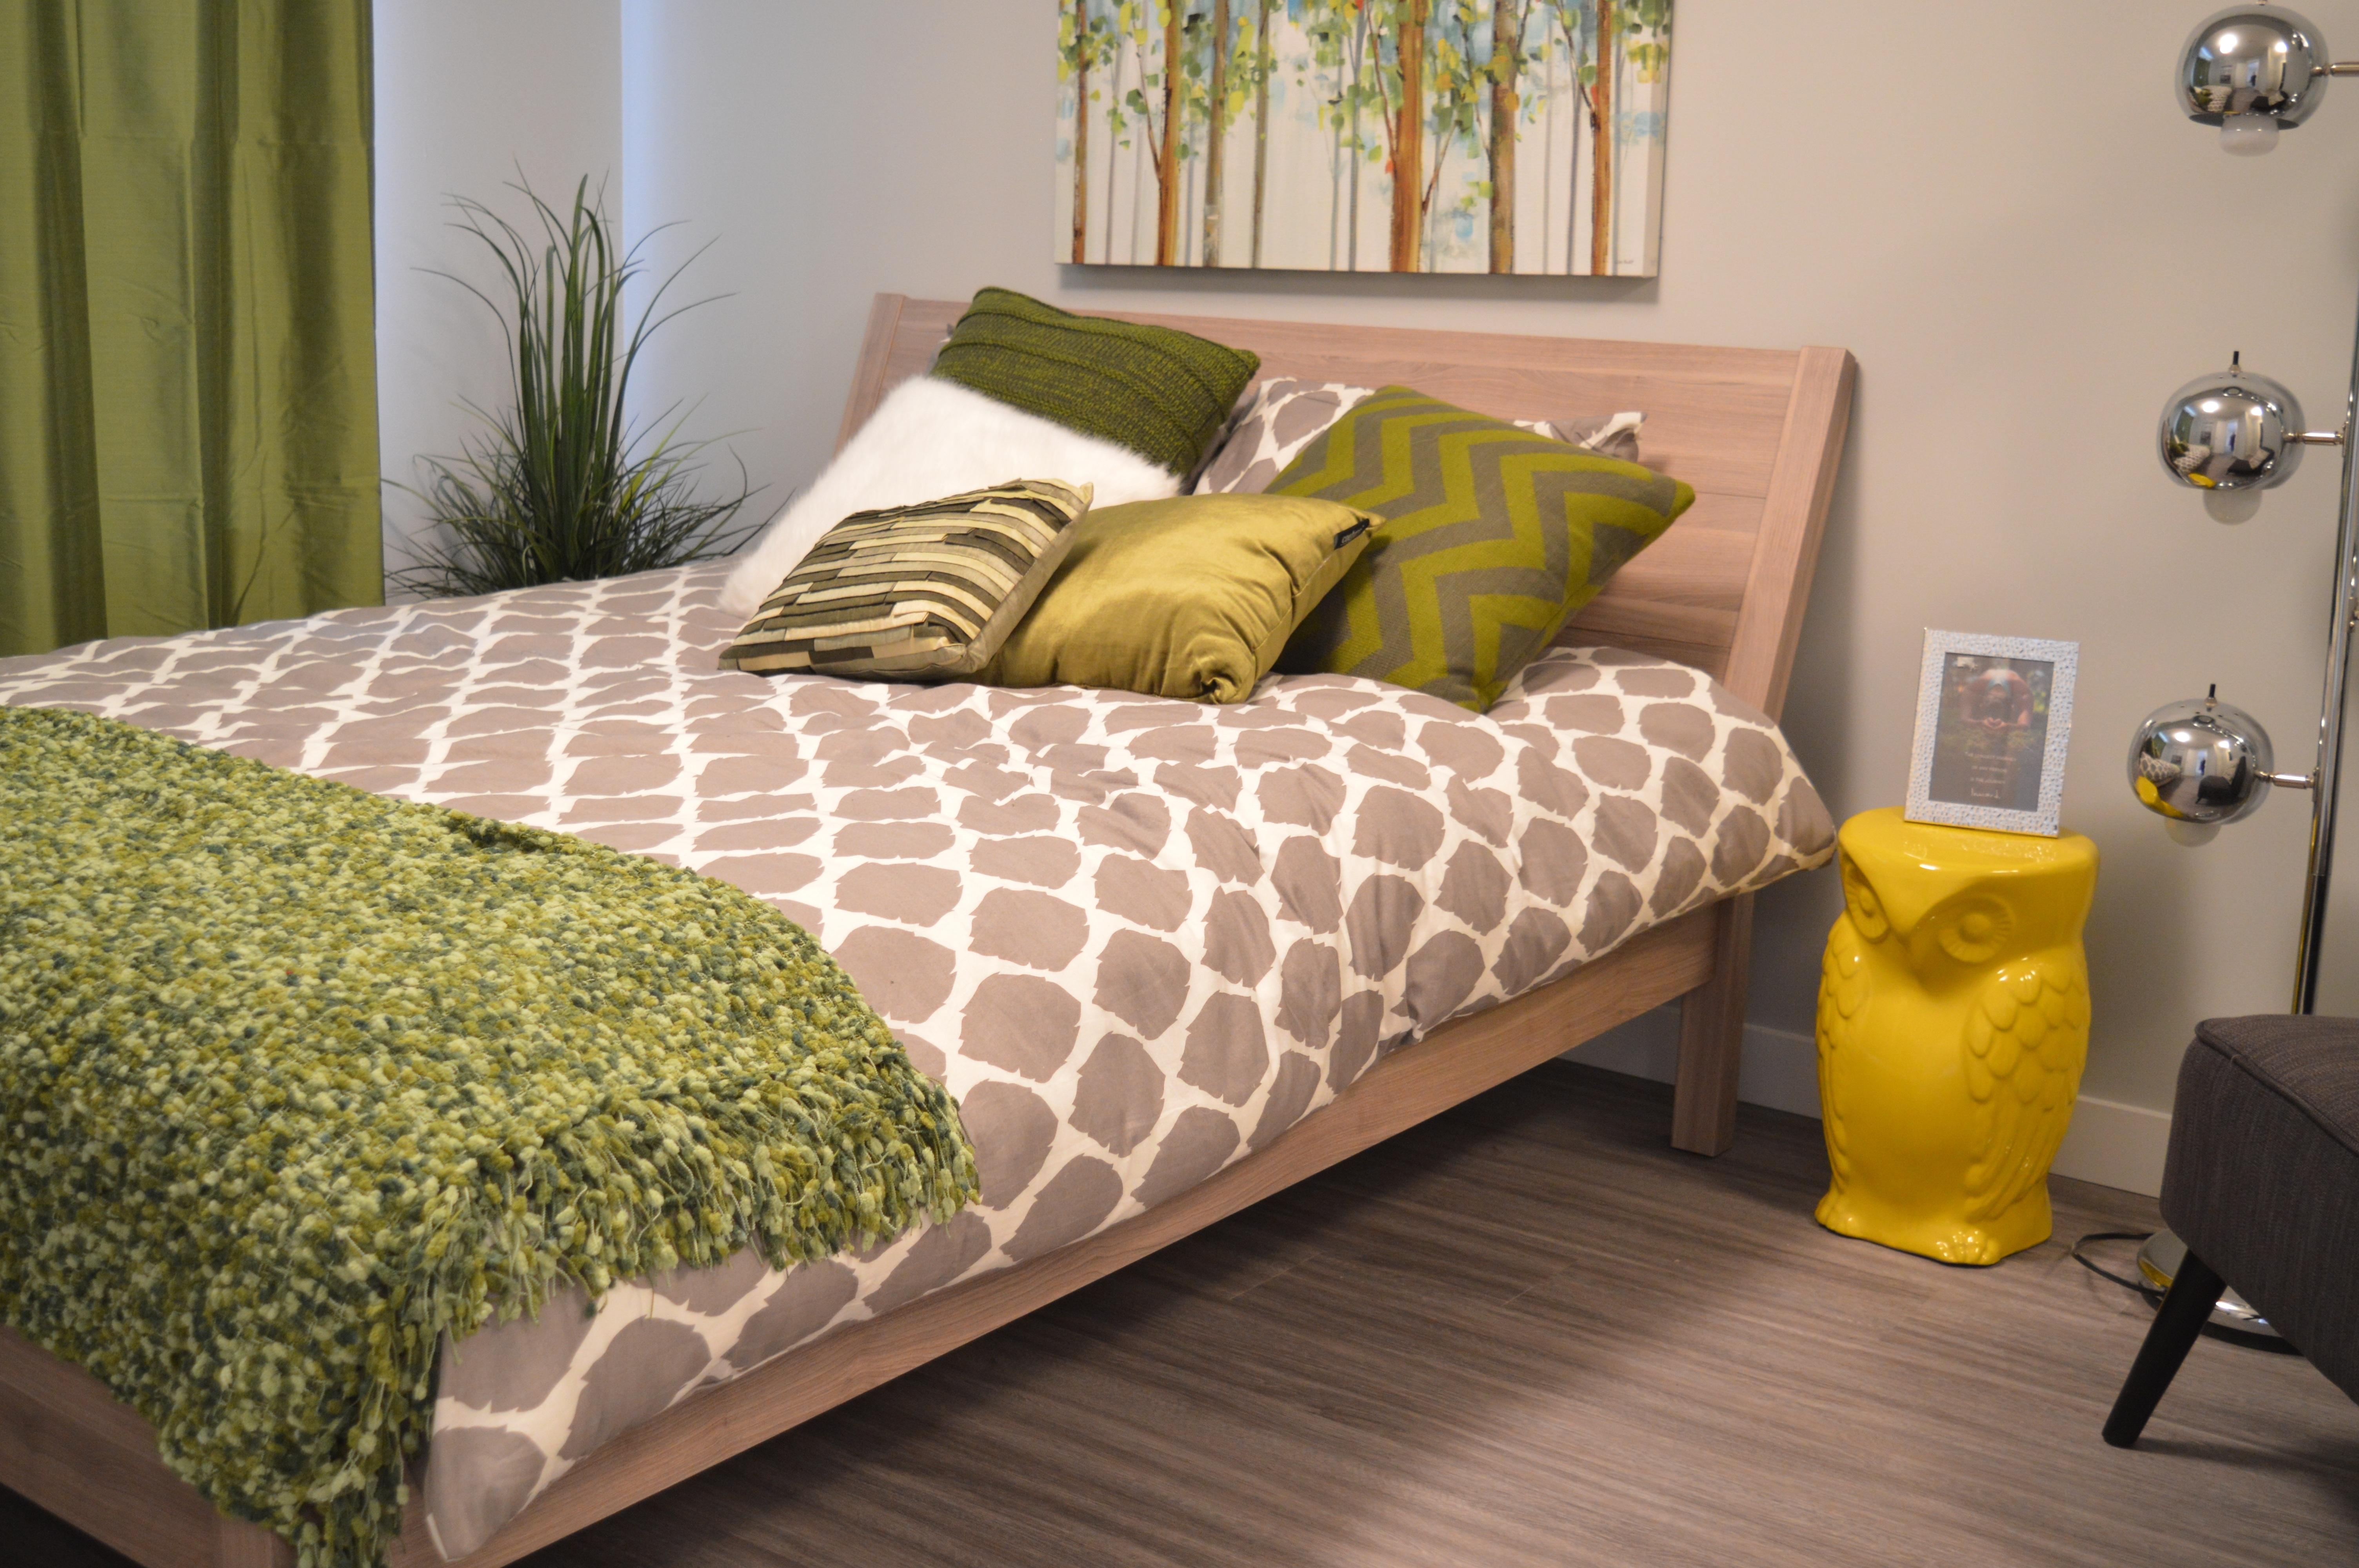 search bedding room design ideas cottage m living cottages